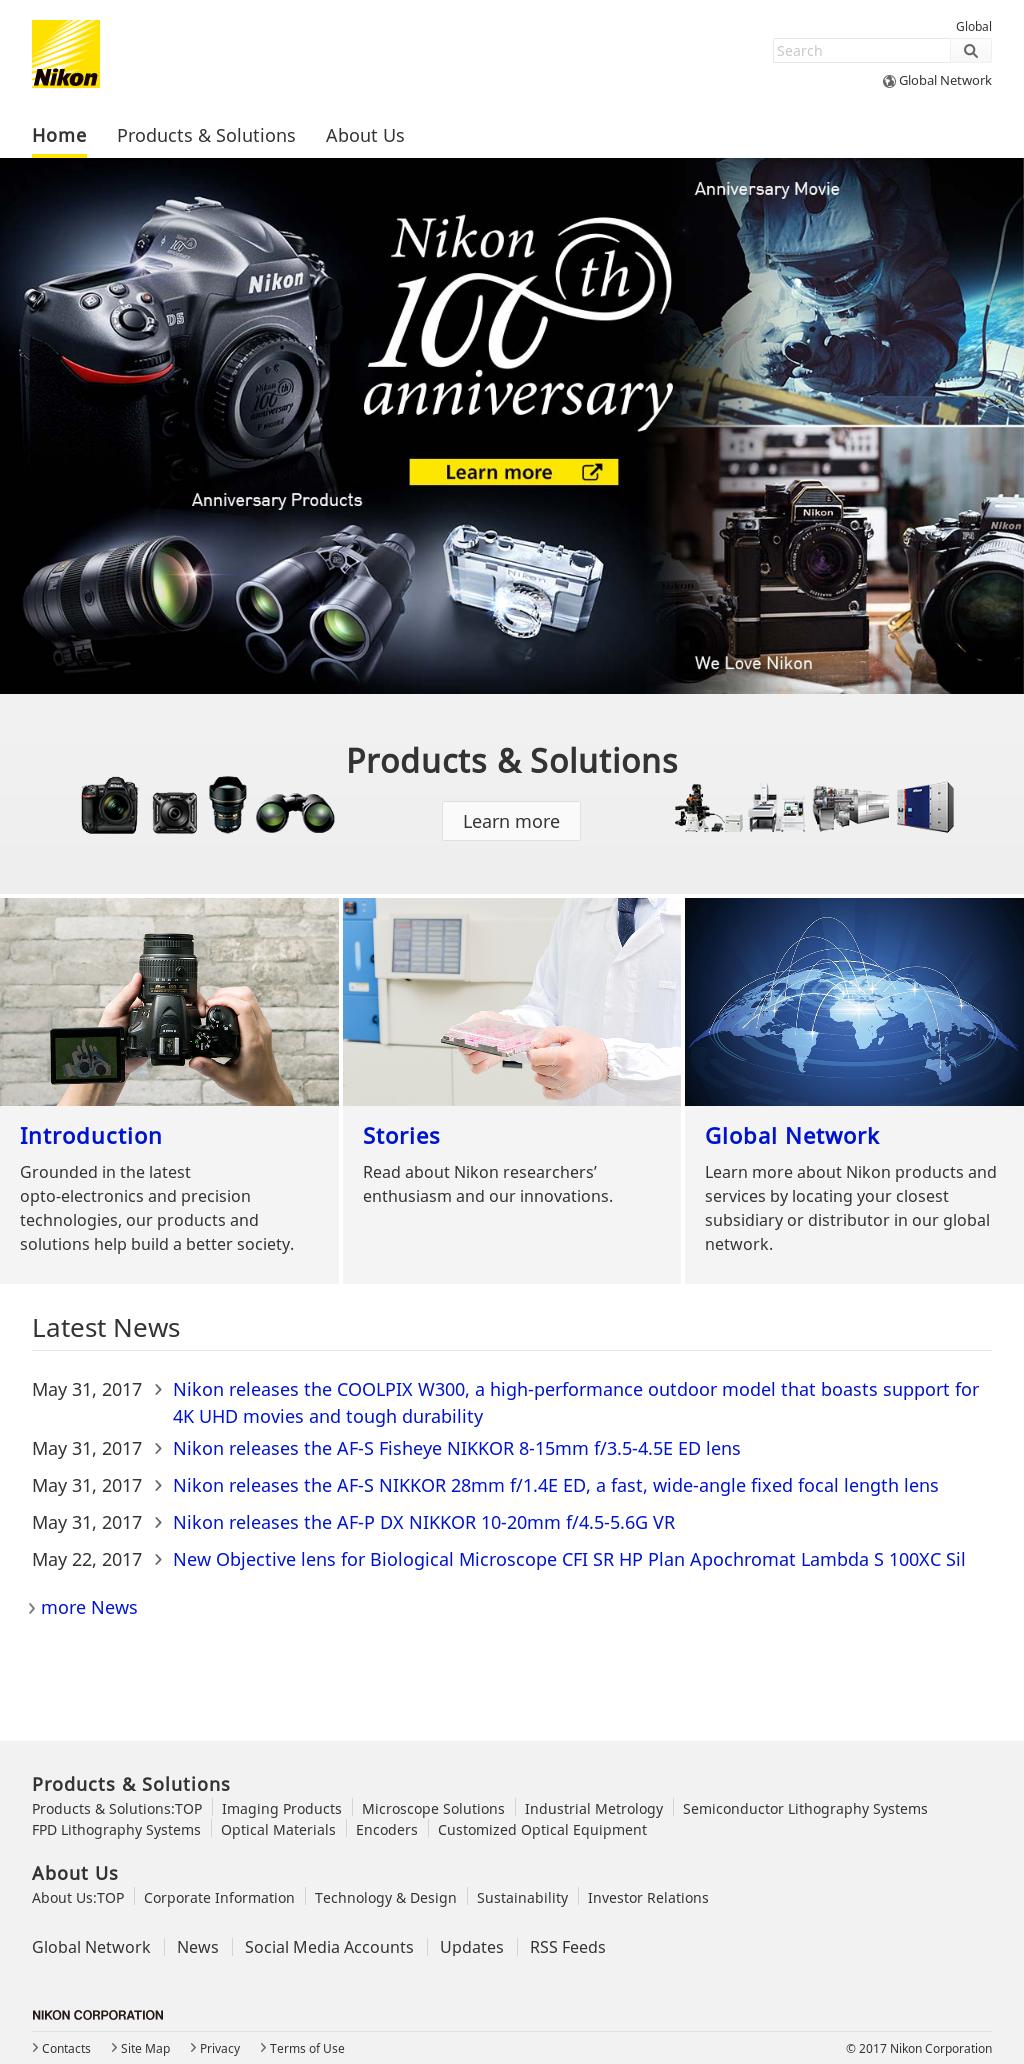 Nikon Competitors, Revenue and Employees - Owler Company Profile